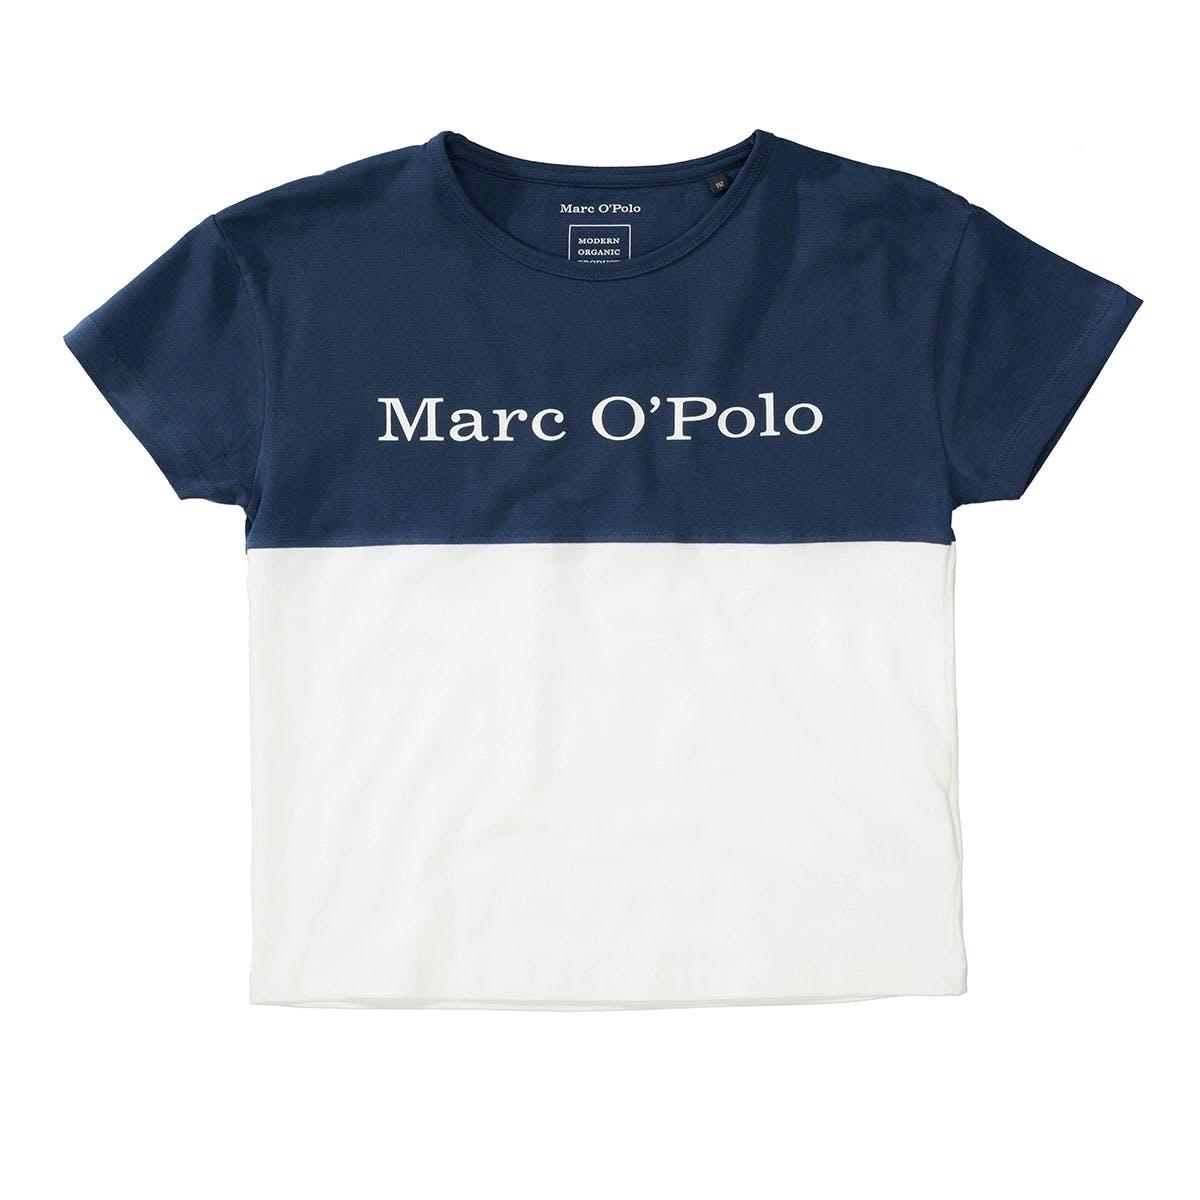 MARC O'POLO T-Shirt aus Bio-Baumwolle - Washed Blue